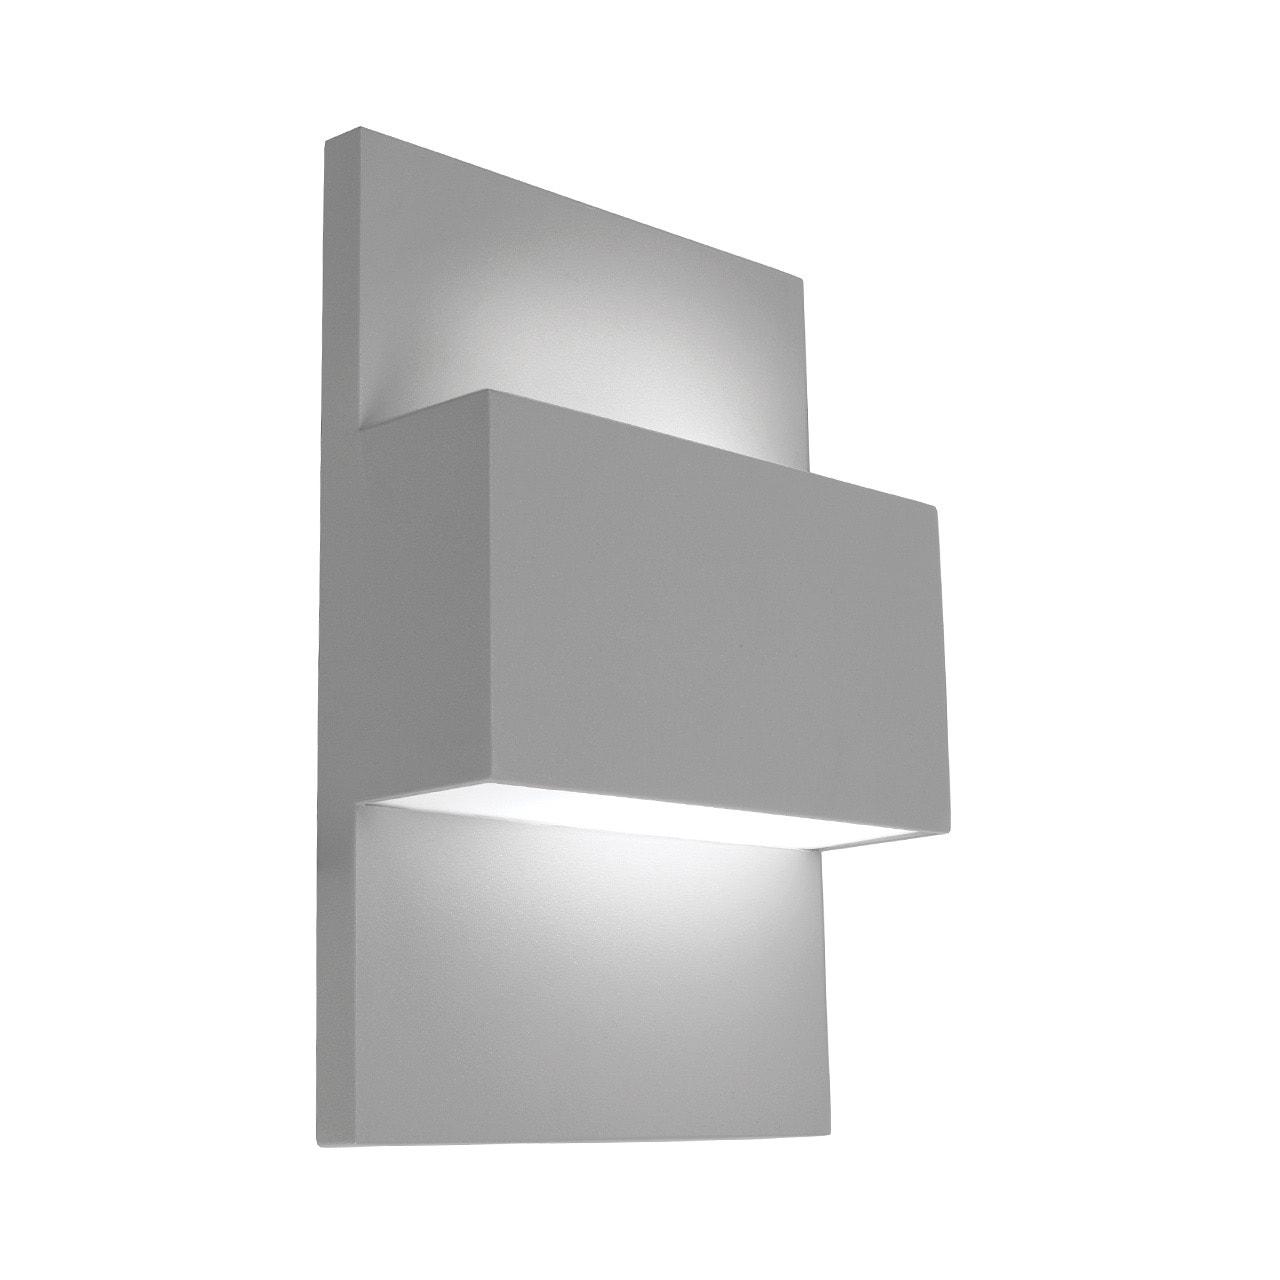 Geneve vägglampa Aluminium